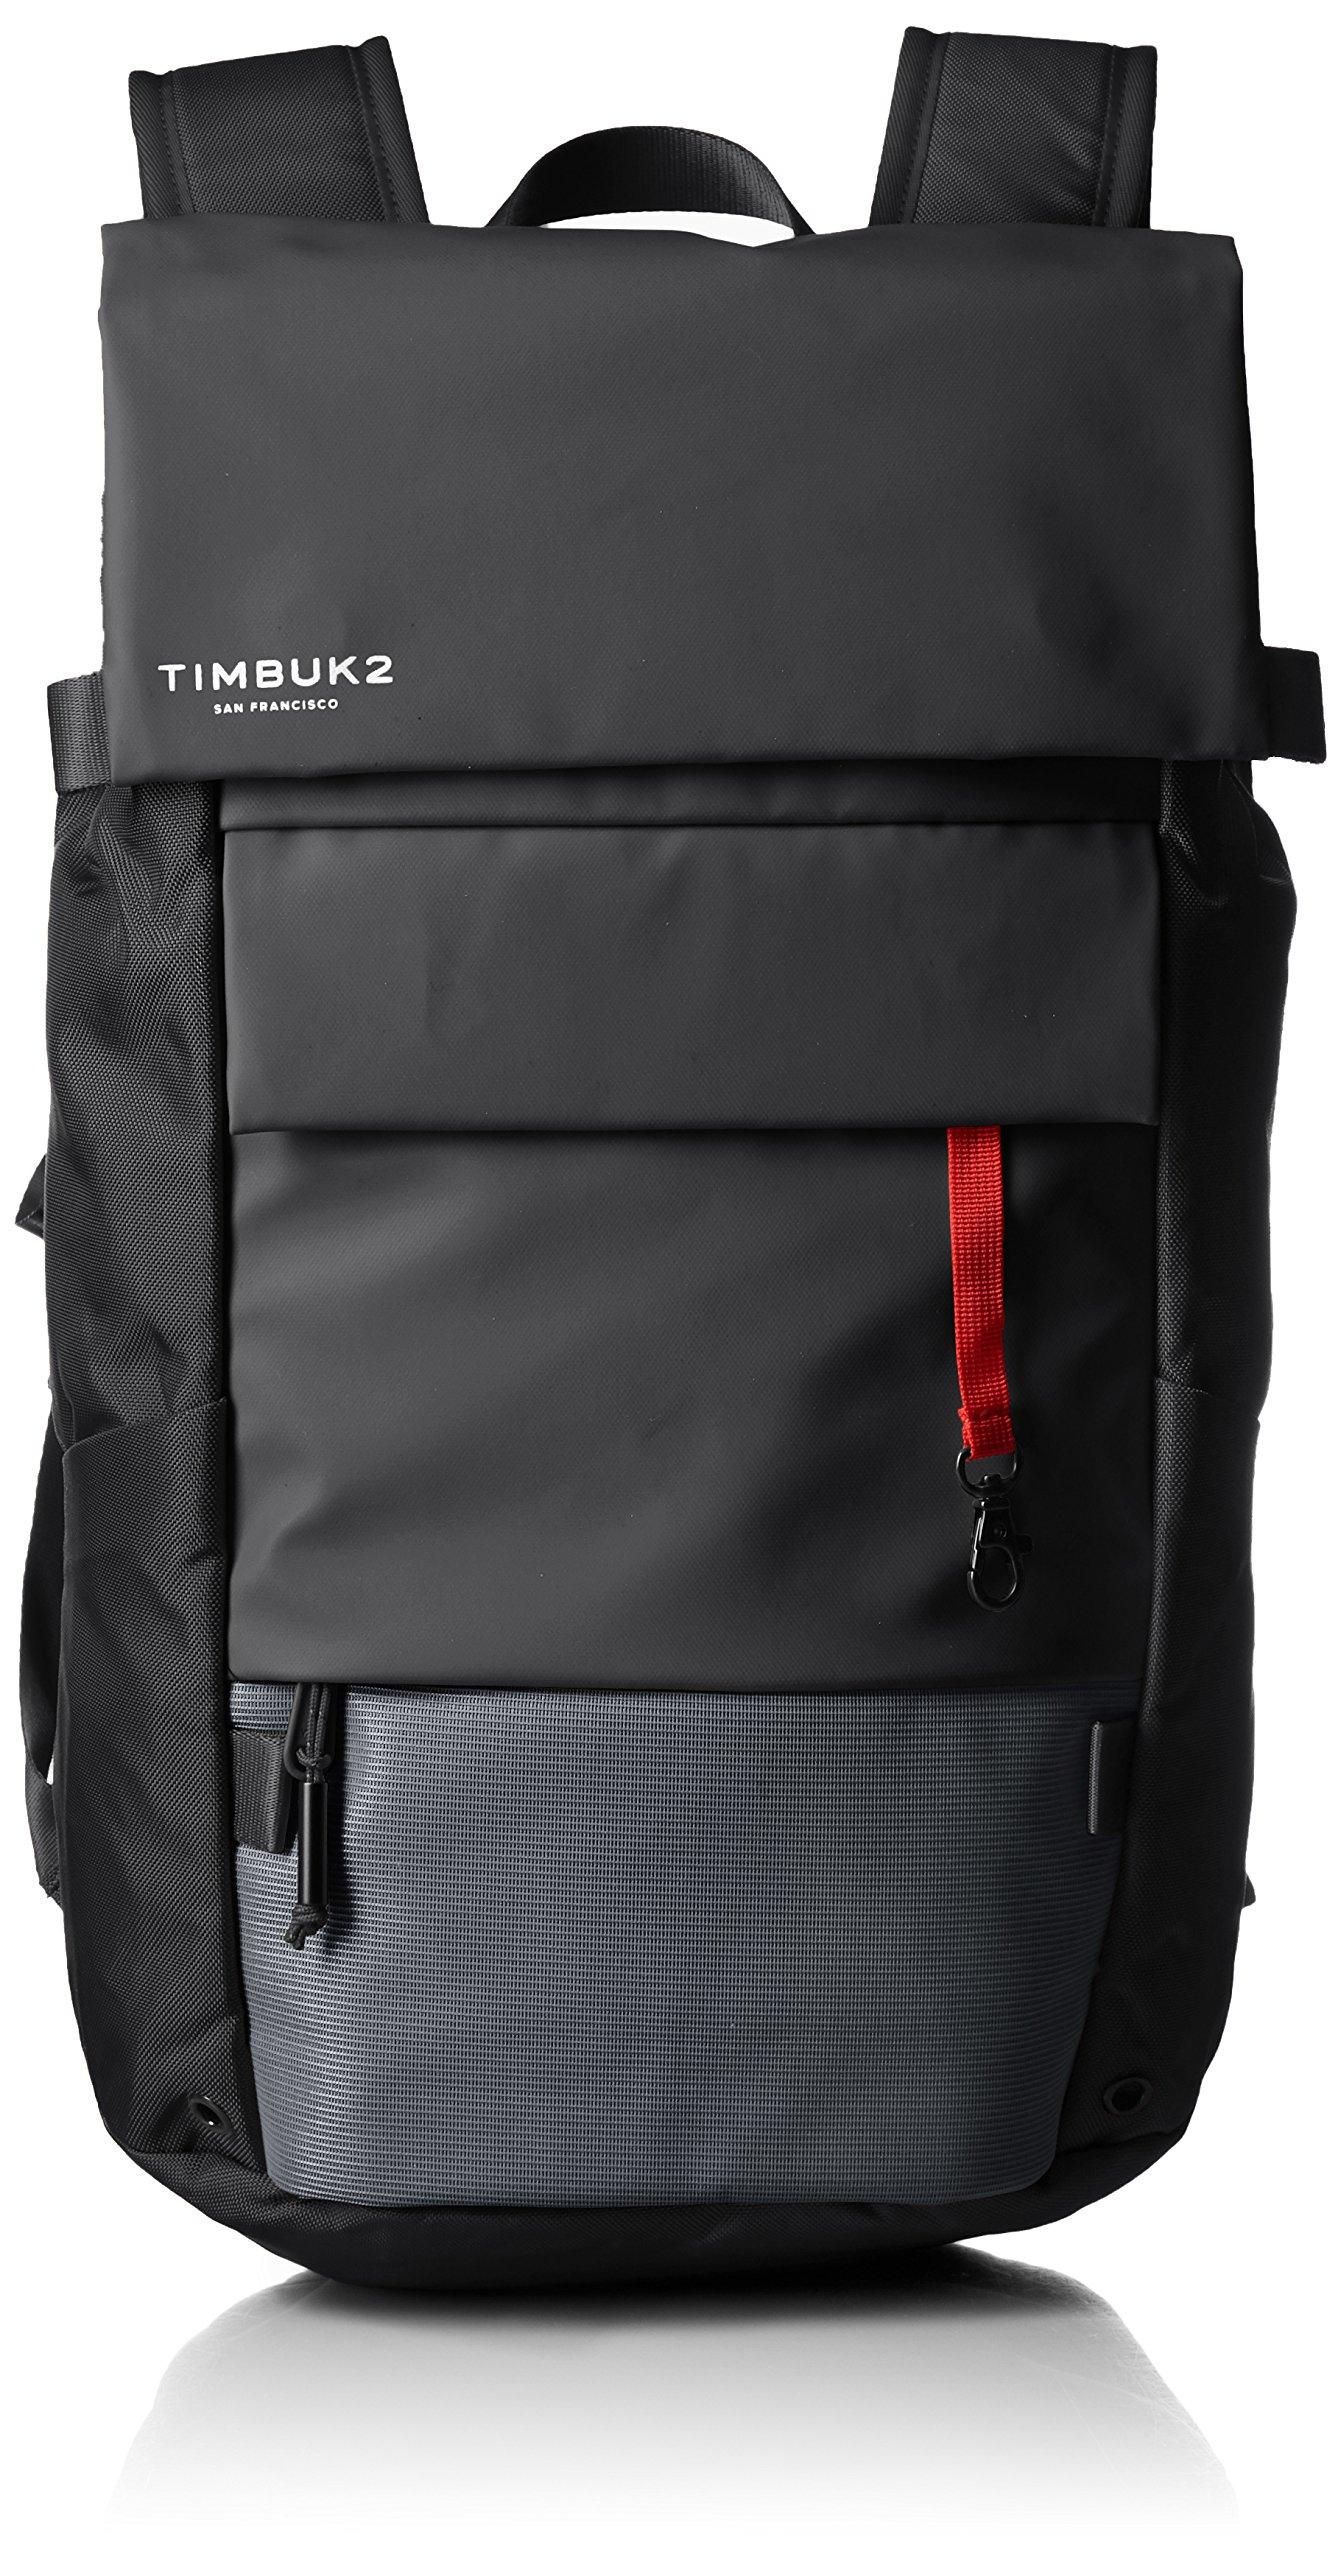 Timbuk2 Robin Pack, Jet Black, One Size by Timbuk2